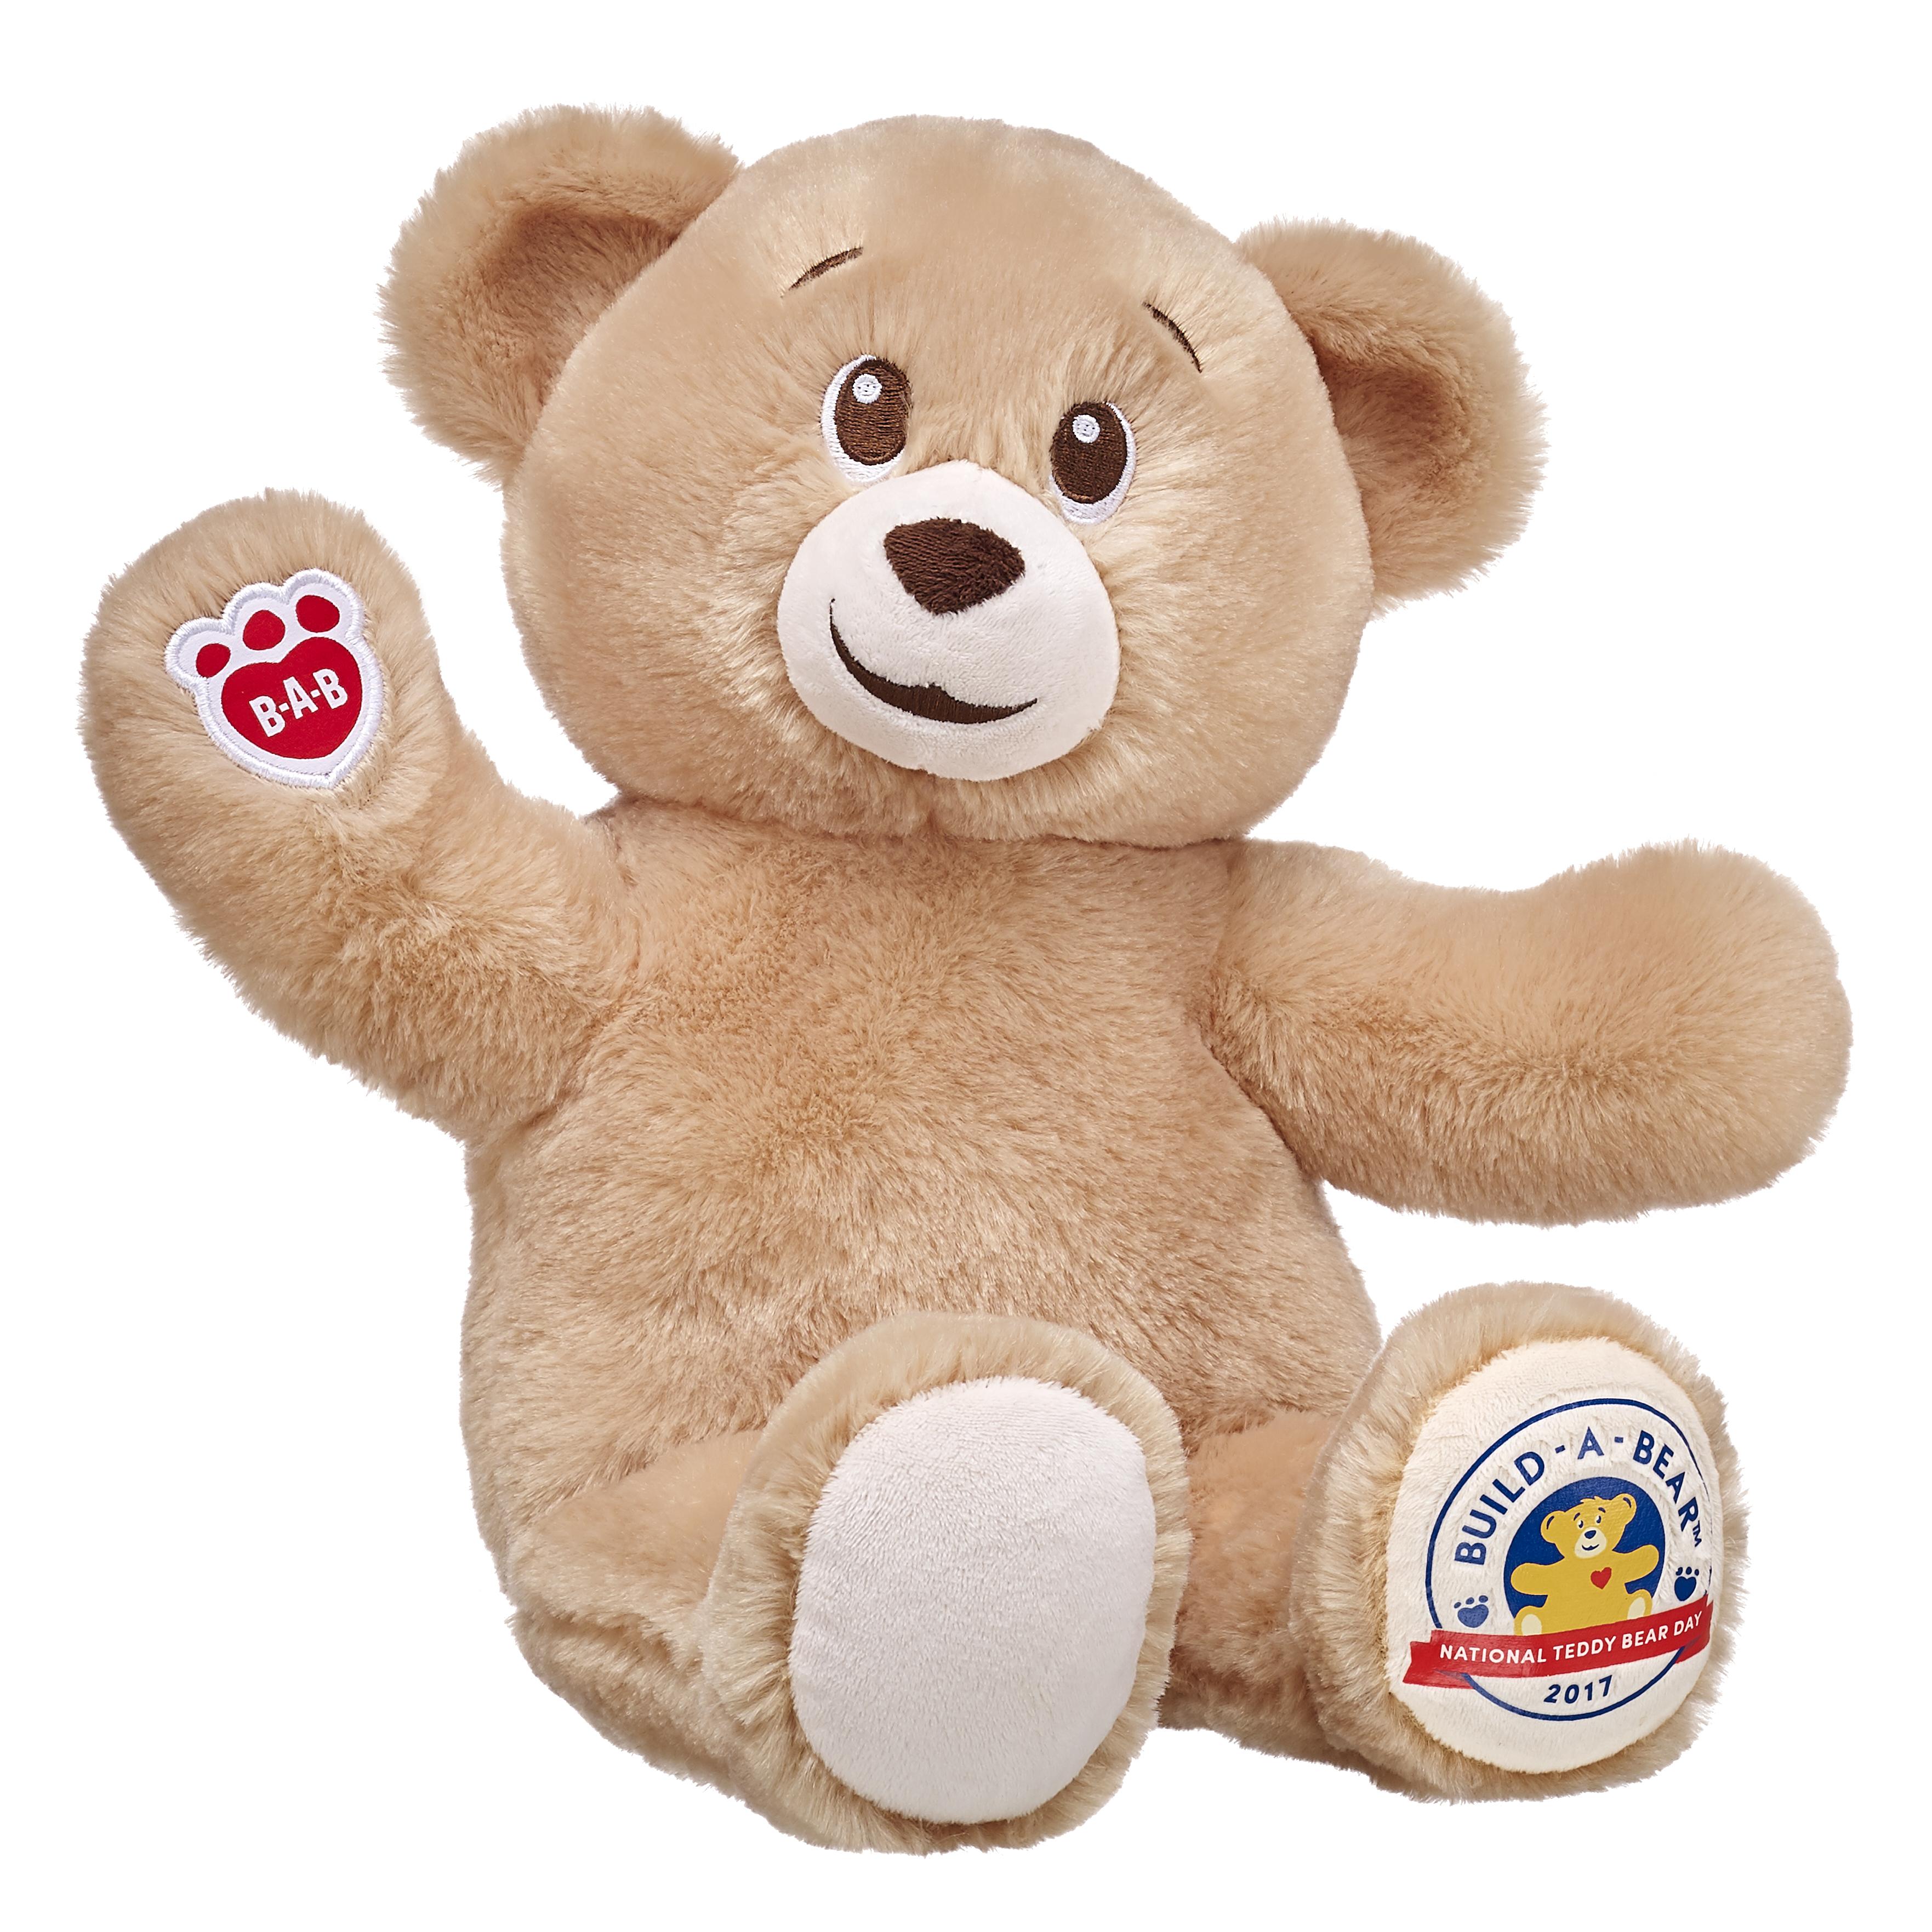 How To Celebrate #NationalTeddyBearDay With A Teddy Bear